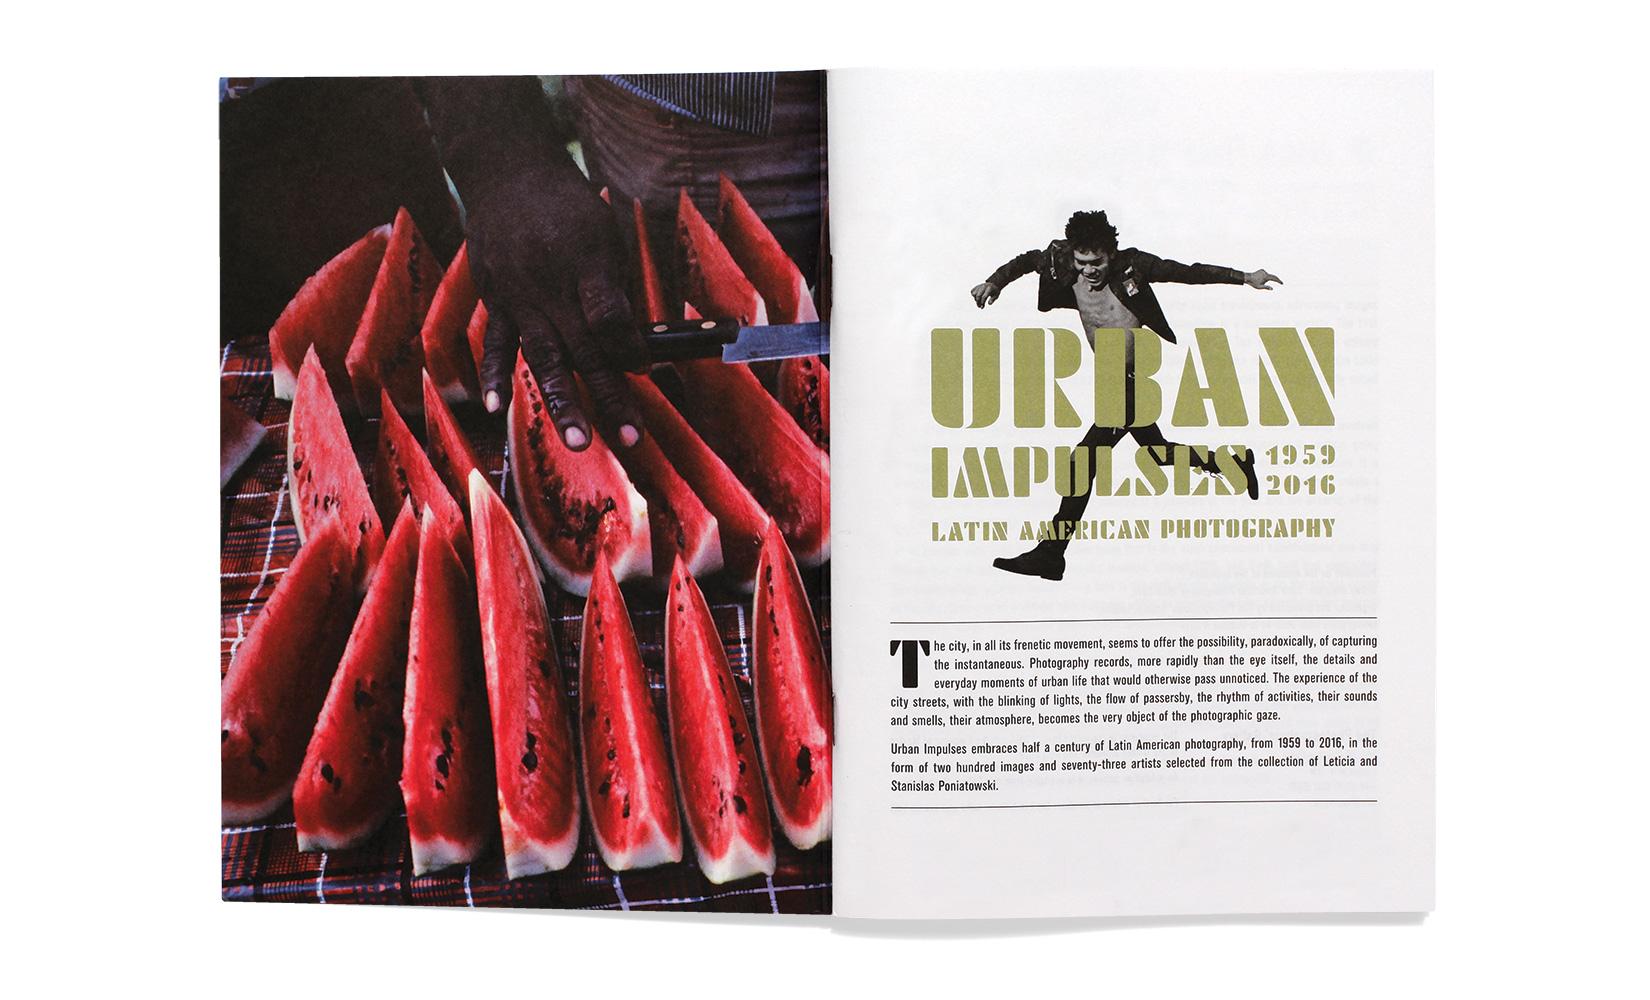 URBAN-IMPULSES-OLIVIER-ANDREOTTI-TOLUCA-STUDIO-07.jpg